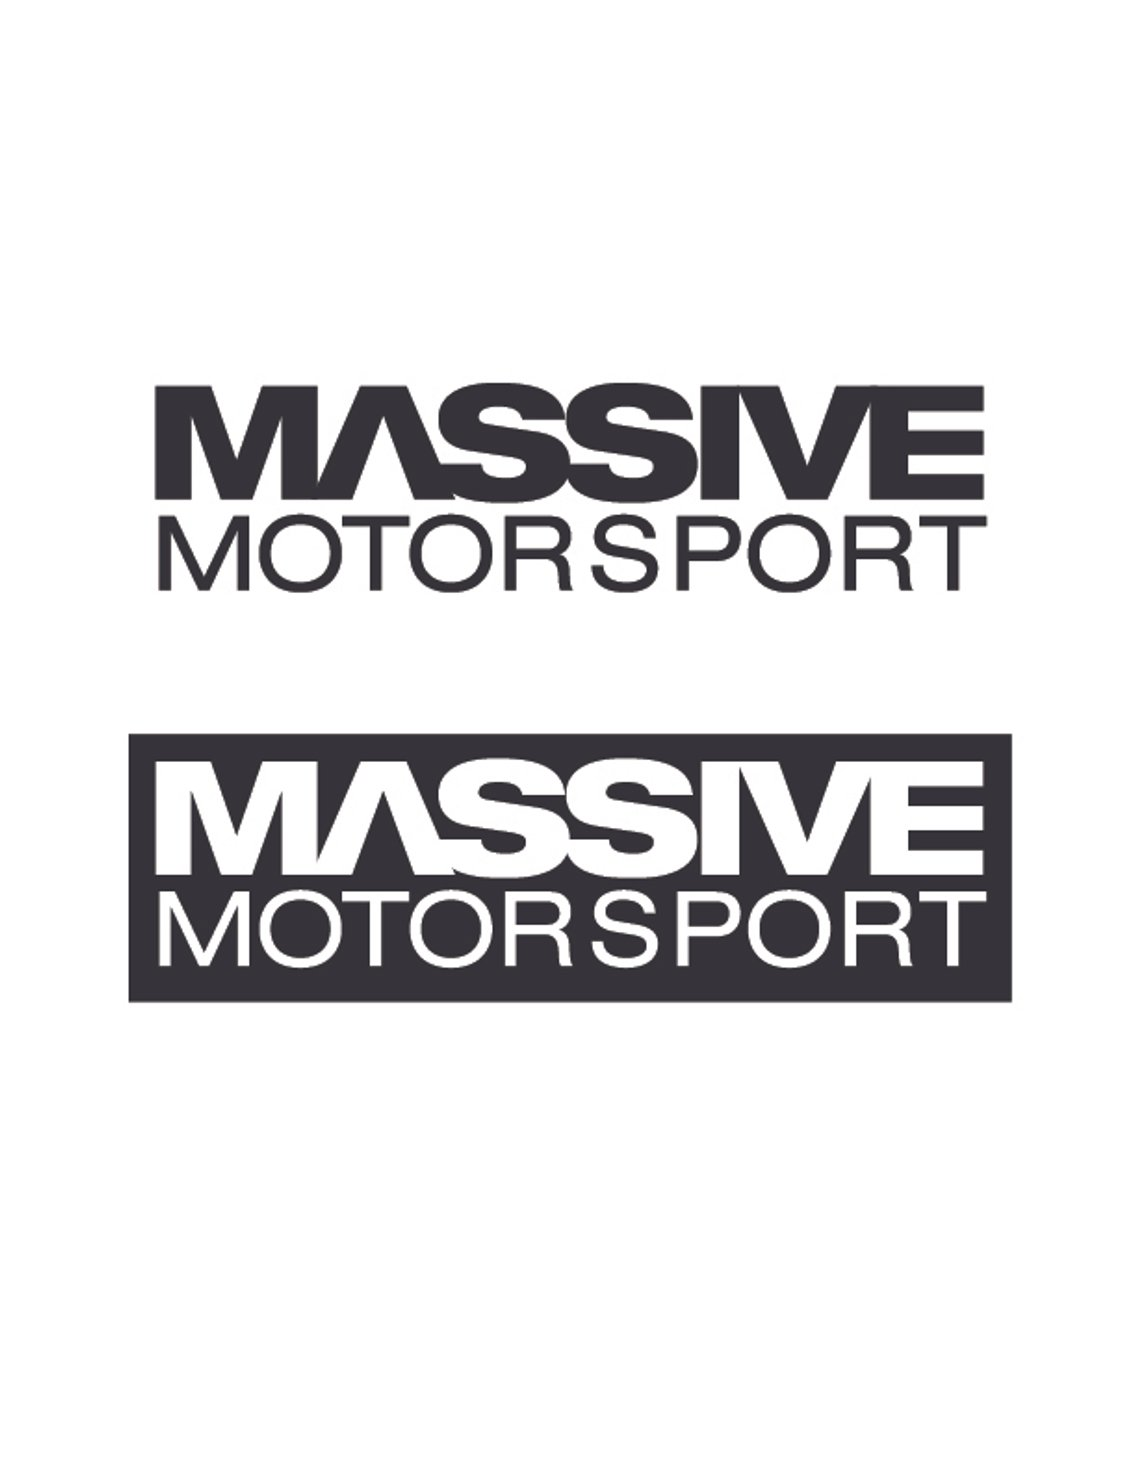 Massive Motorsport Podcast - Cover Image